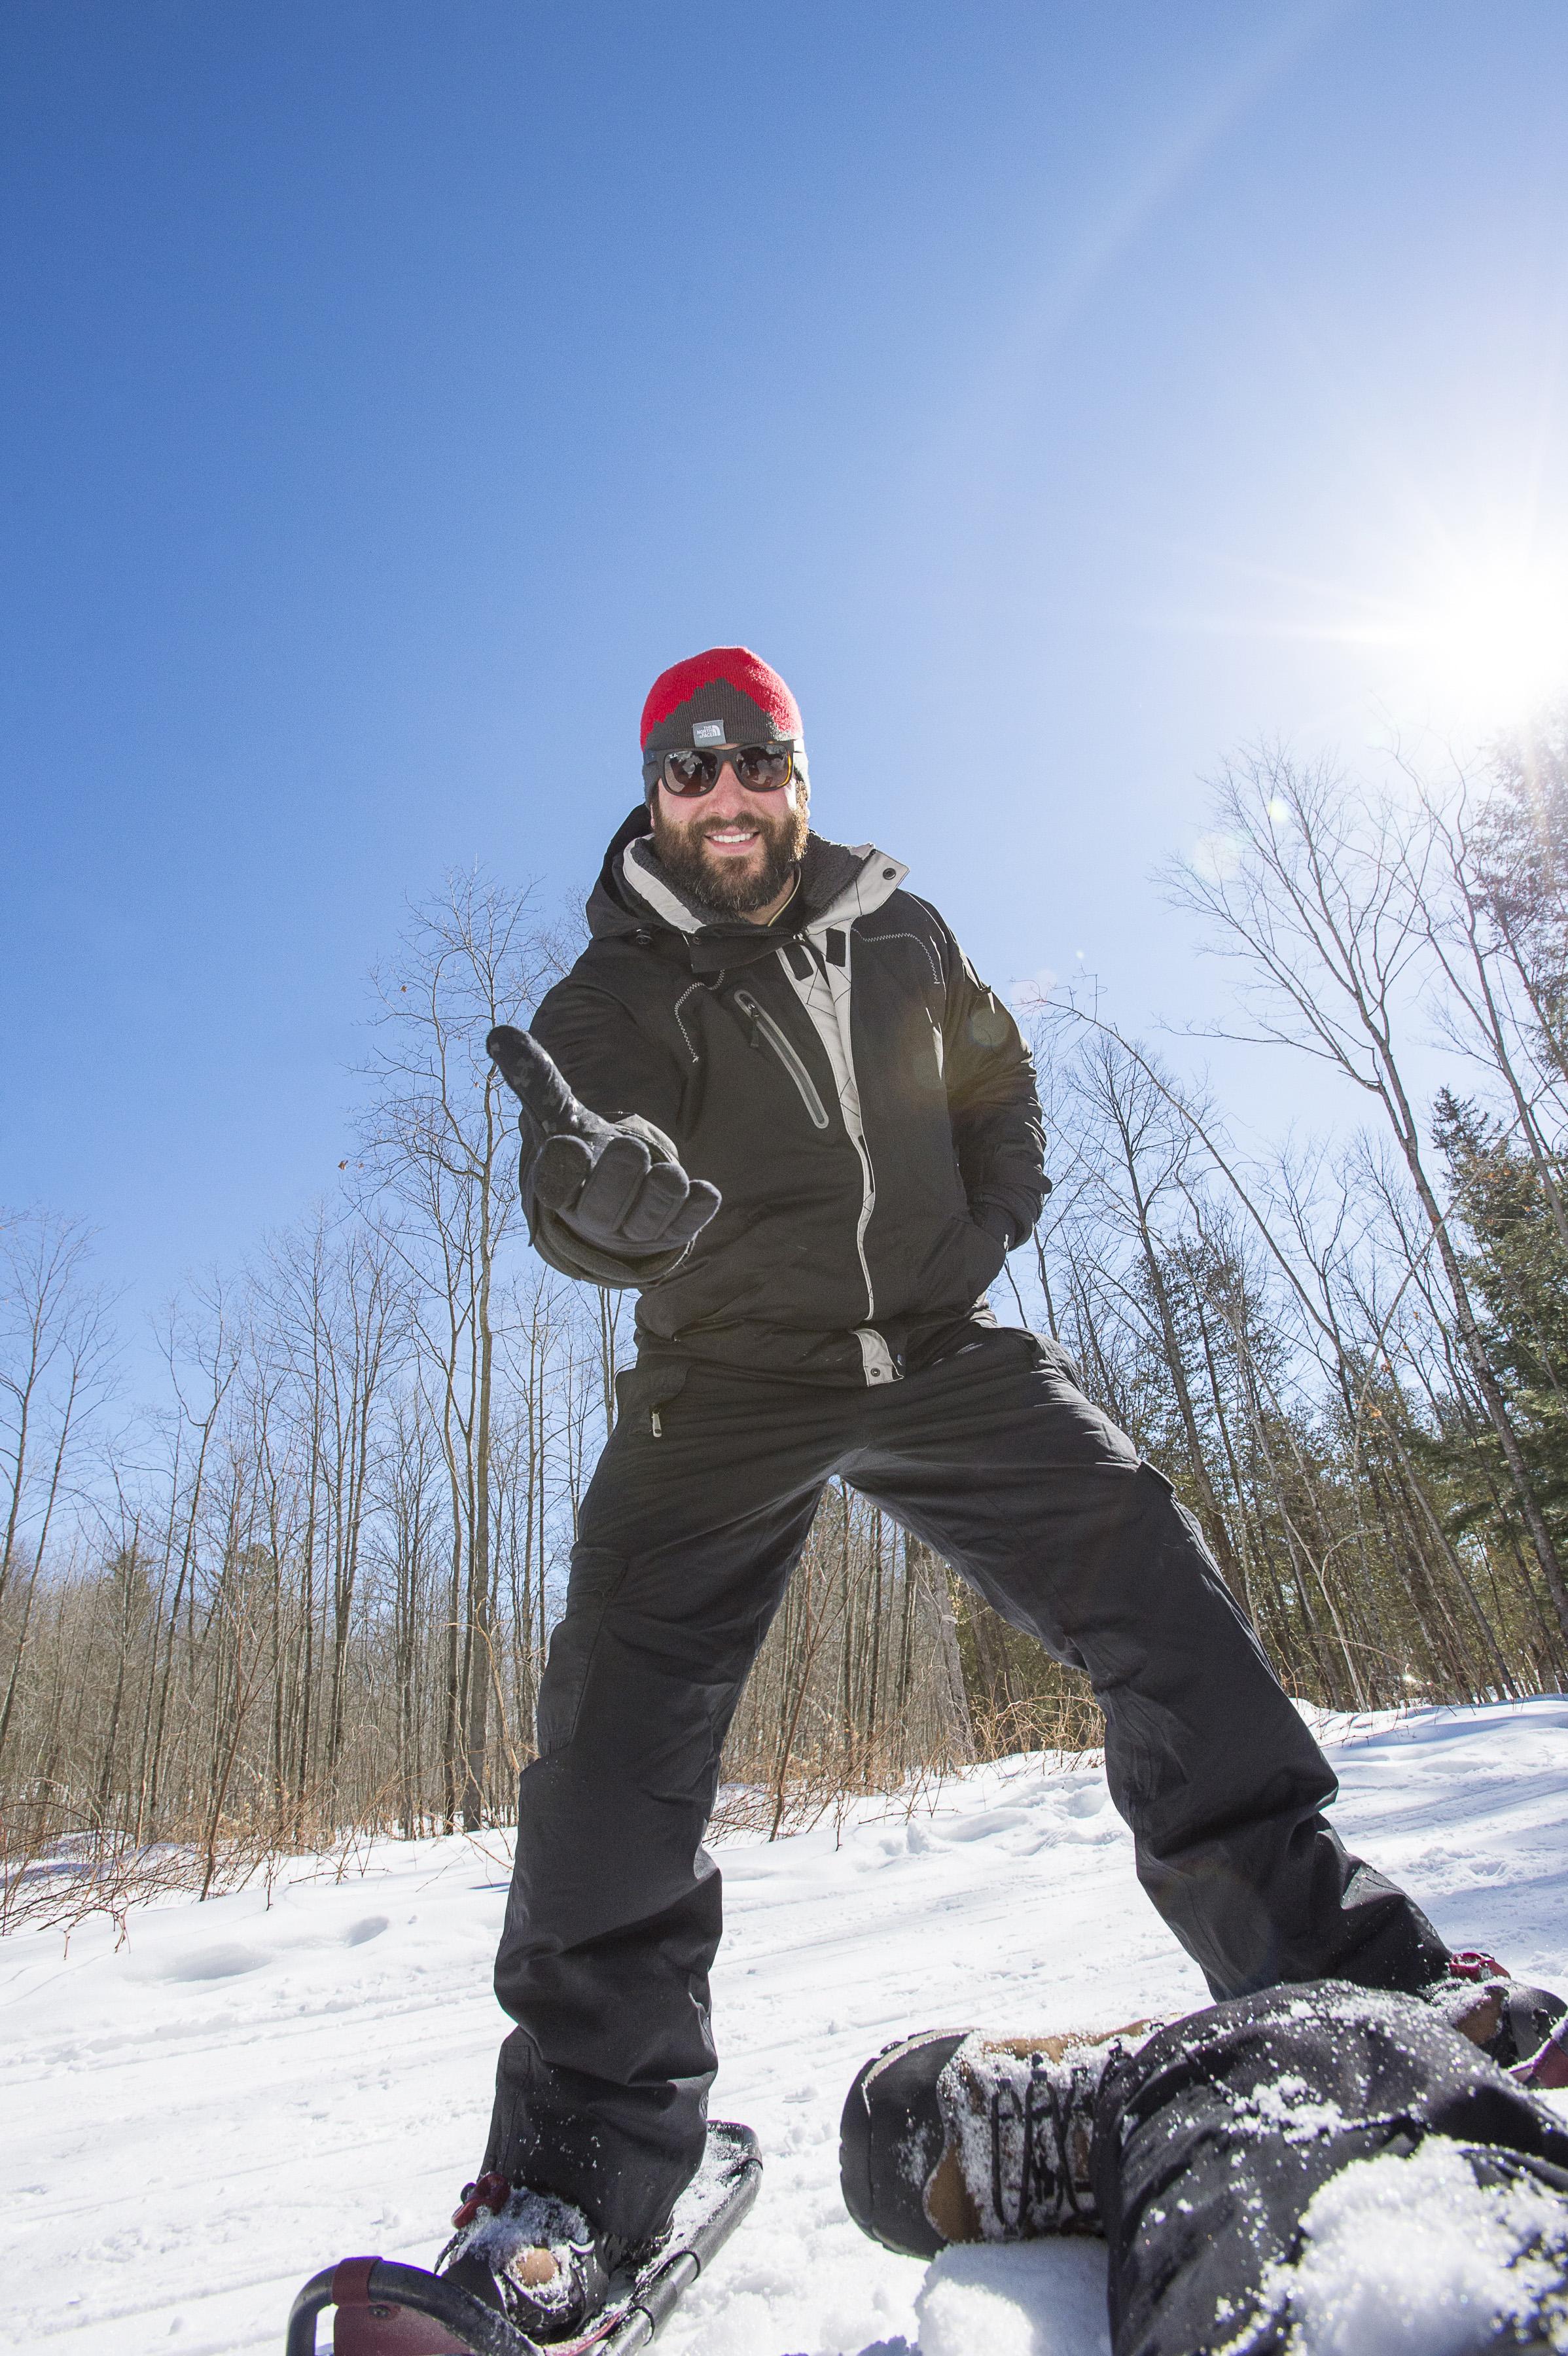 RECREATION _ SNOWSHOEING _ OHTO PHOTOSHOOT _ WINTER _ CREDIT TO TREVOR LUSH _ VERBAL PERMISSION _ 2014 (1)